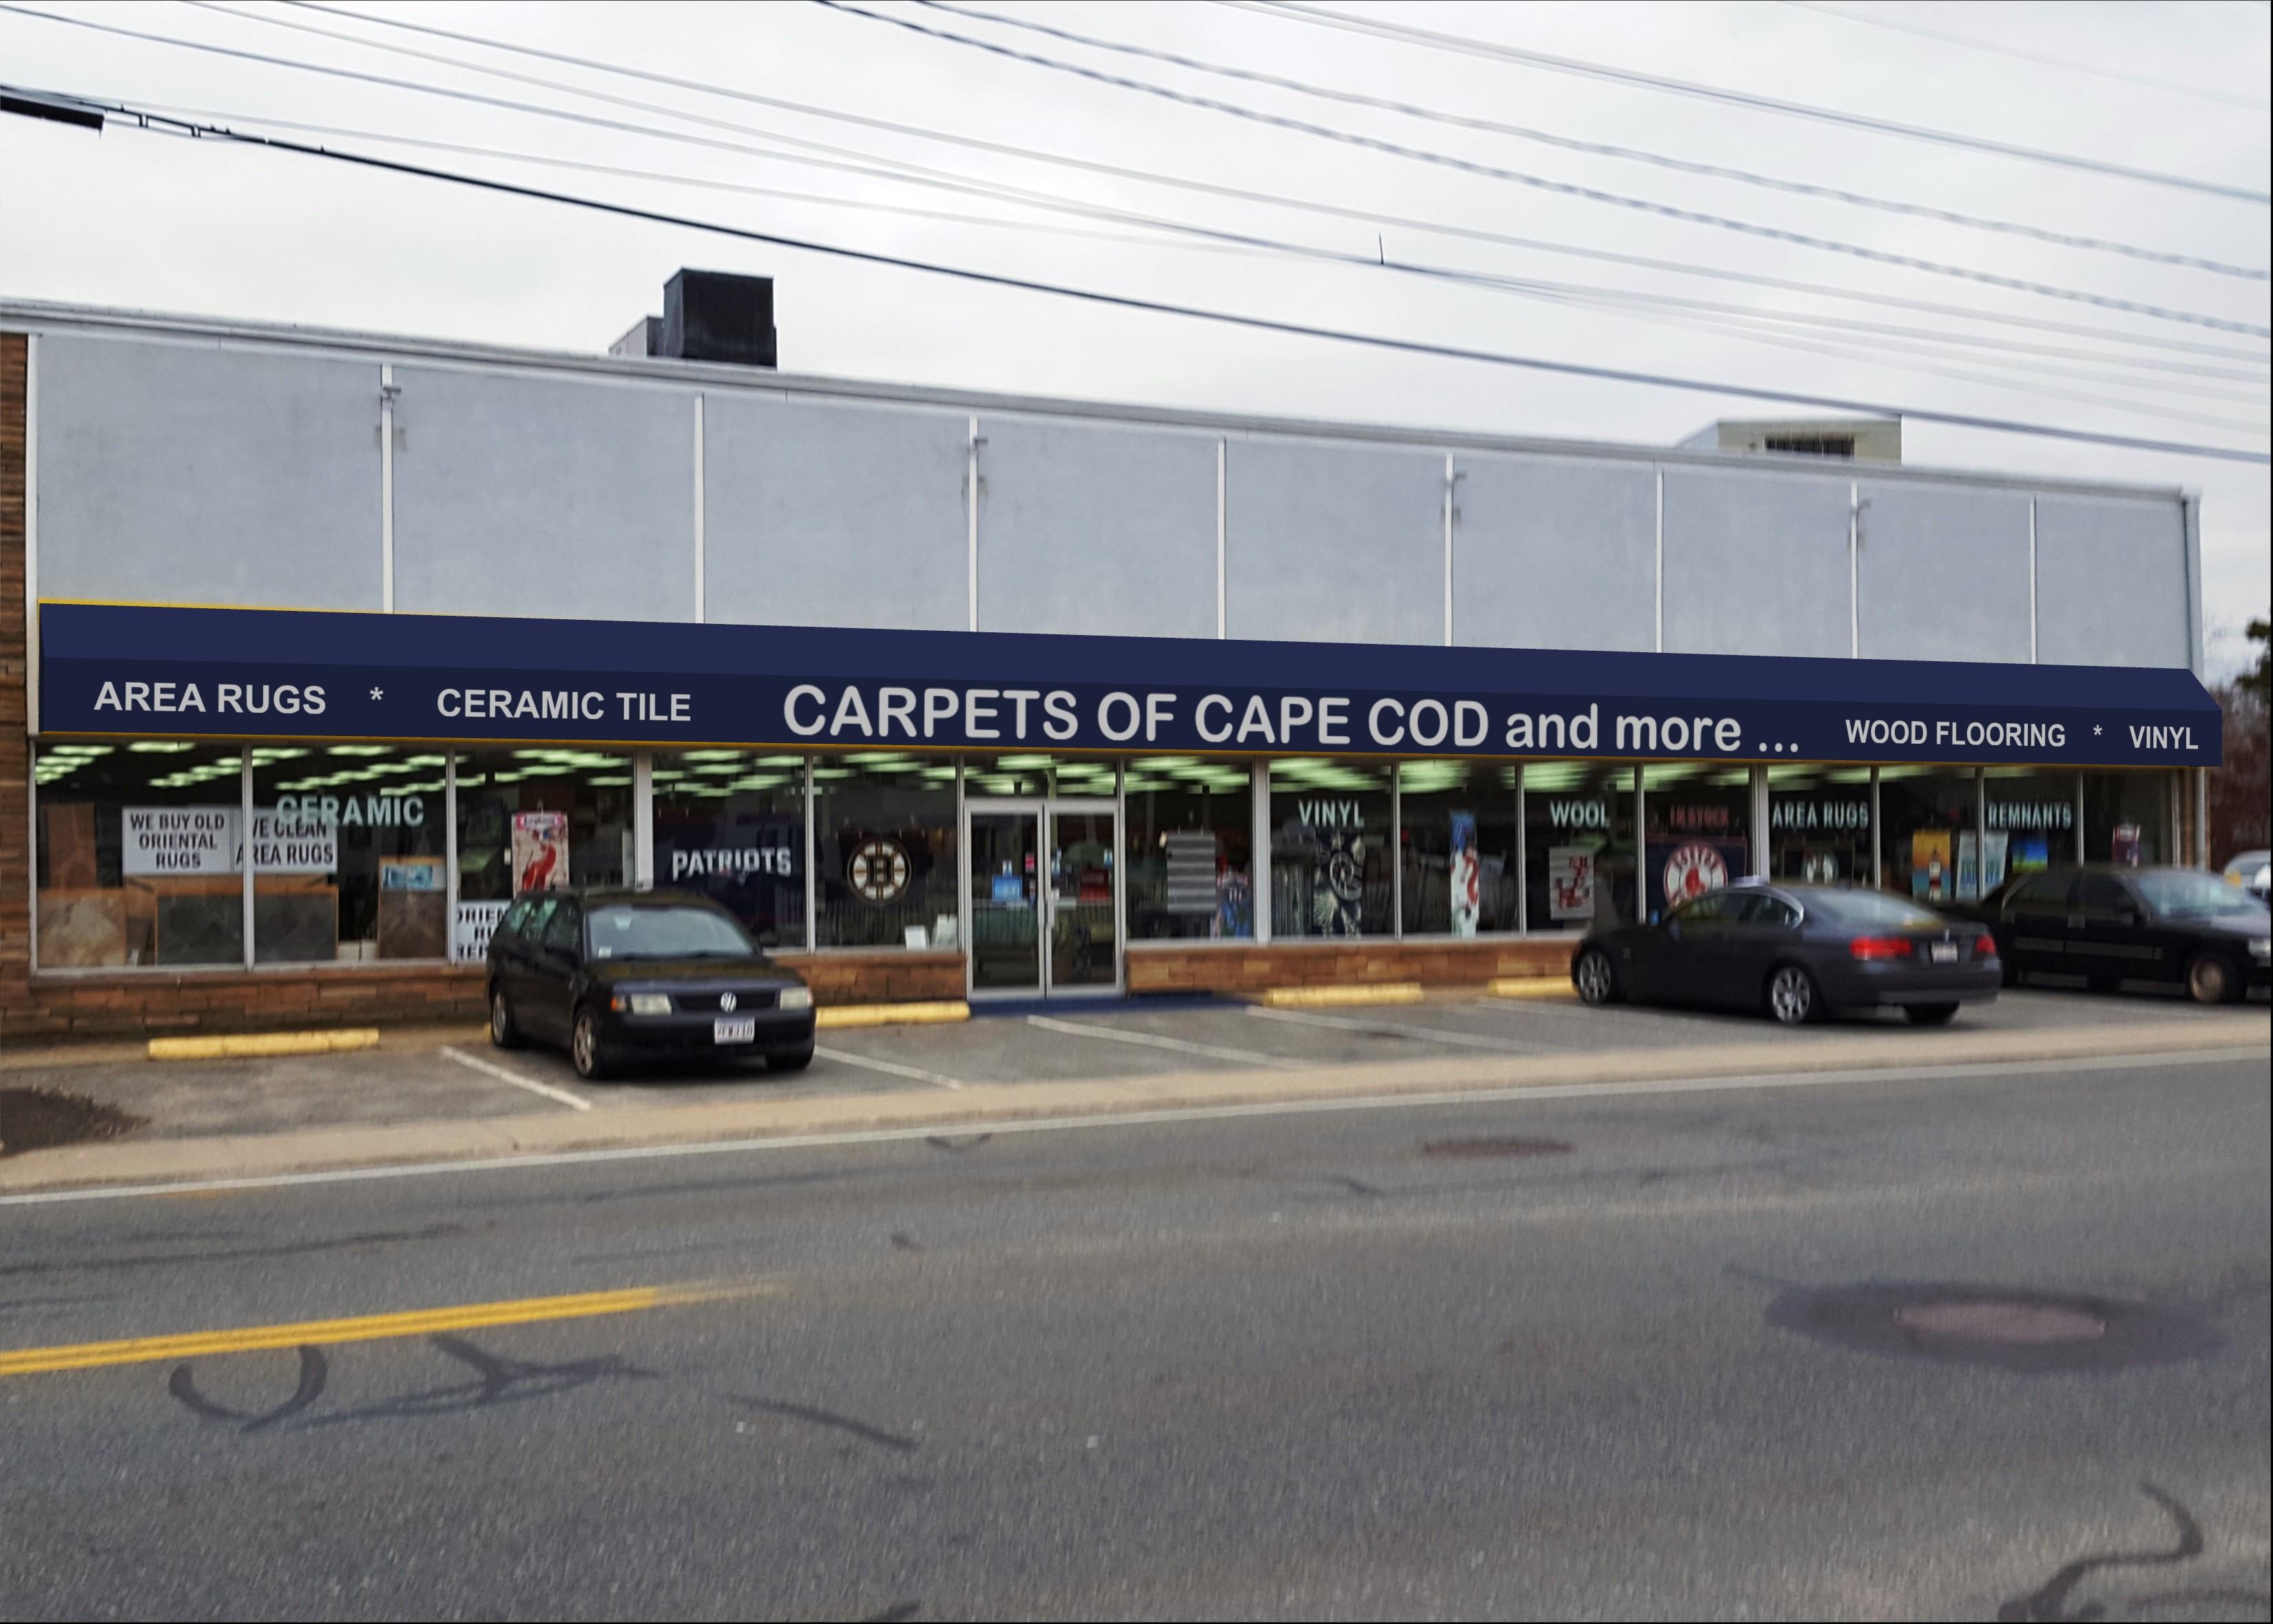 Carpets of Cape Cod & more - 239 Barnstable Rd, Barnstable, MA 02601